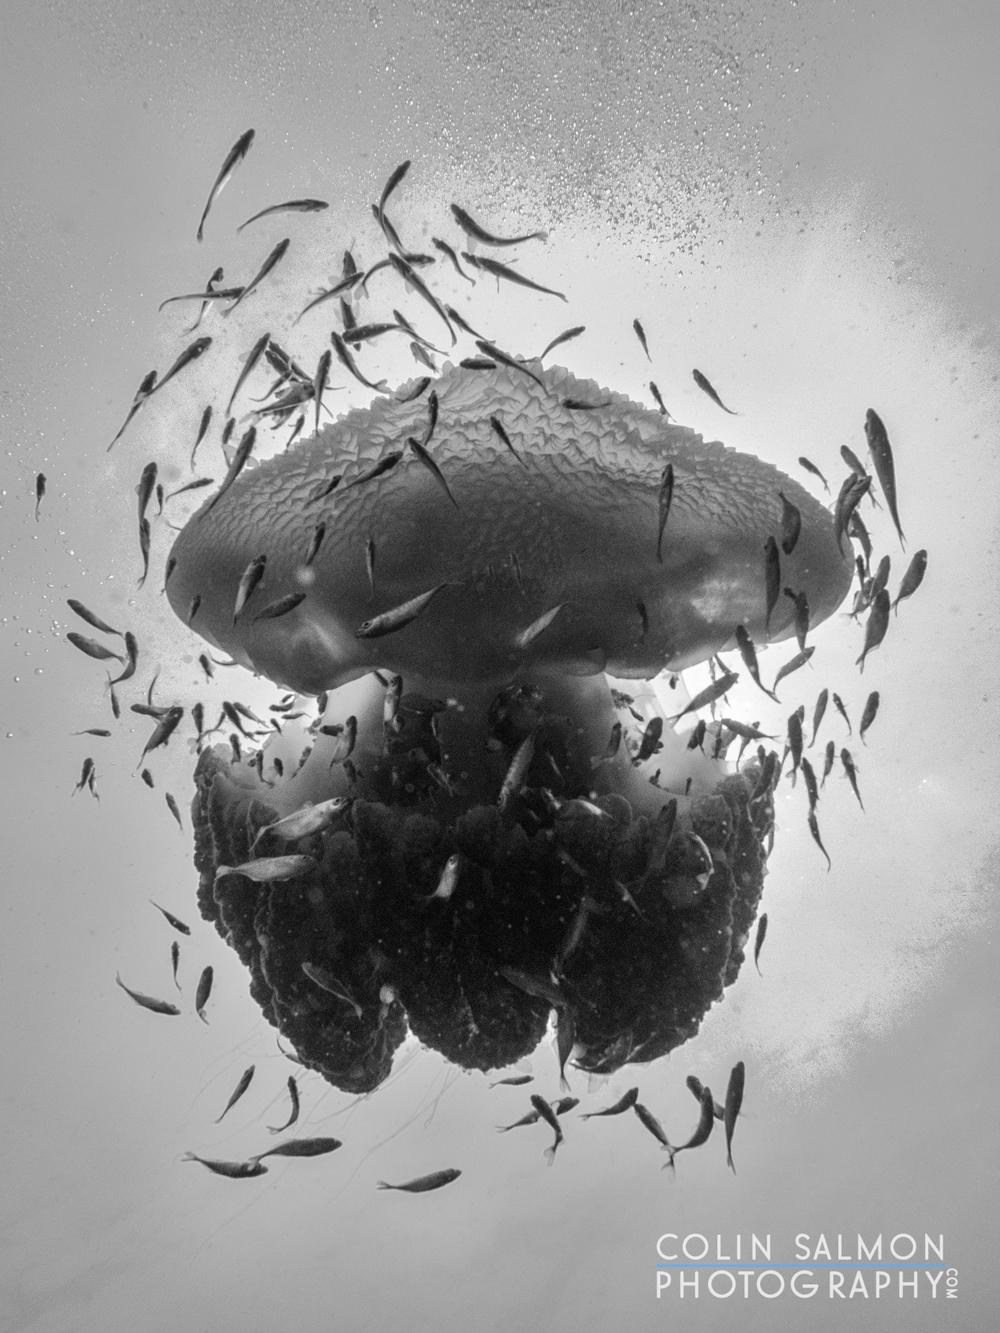 Jellyfish  (Thysanostoma thysanura)  - Sail Rock - Koh Phangan, Thailand